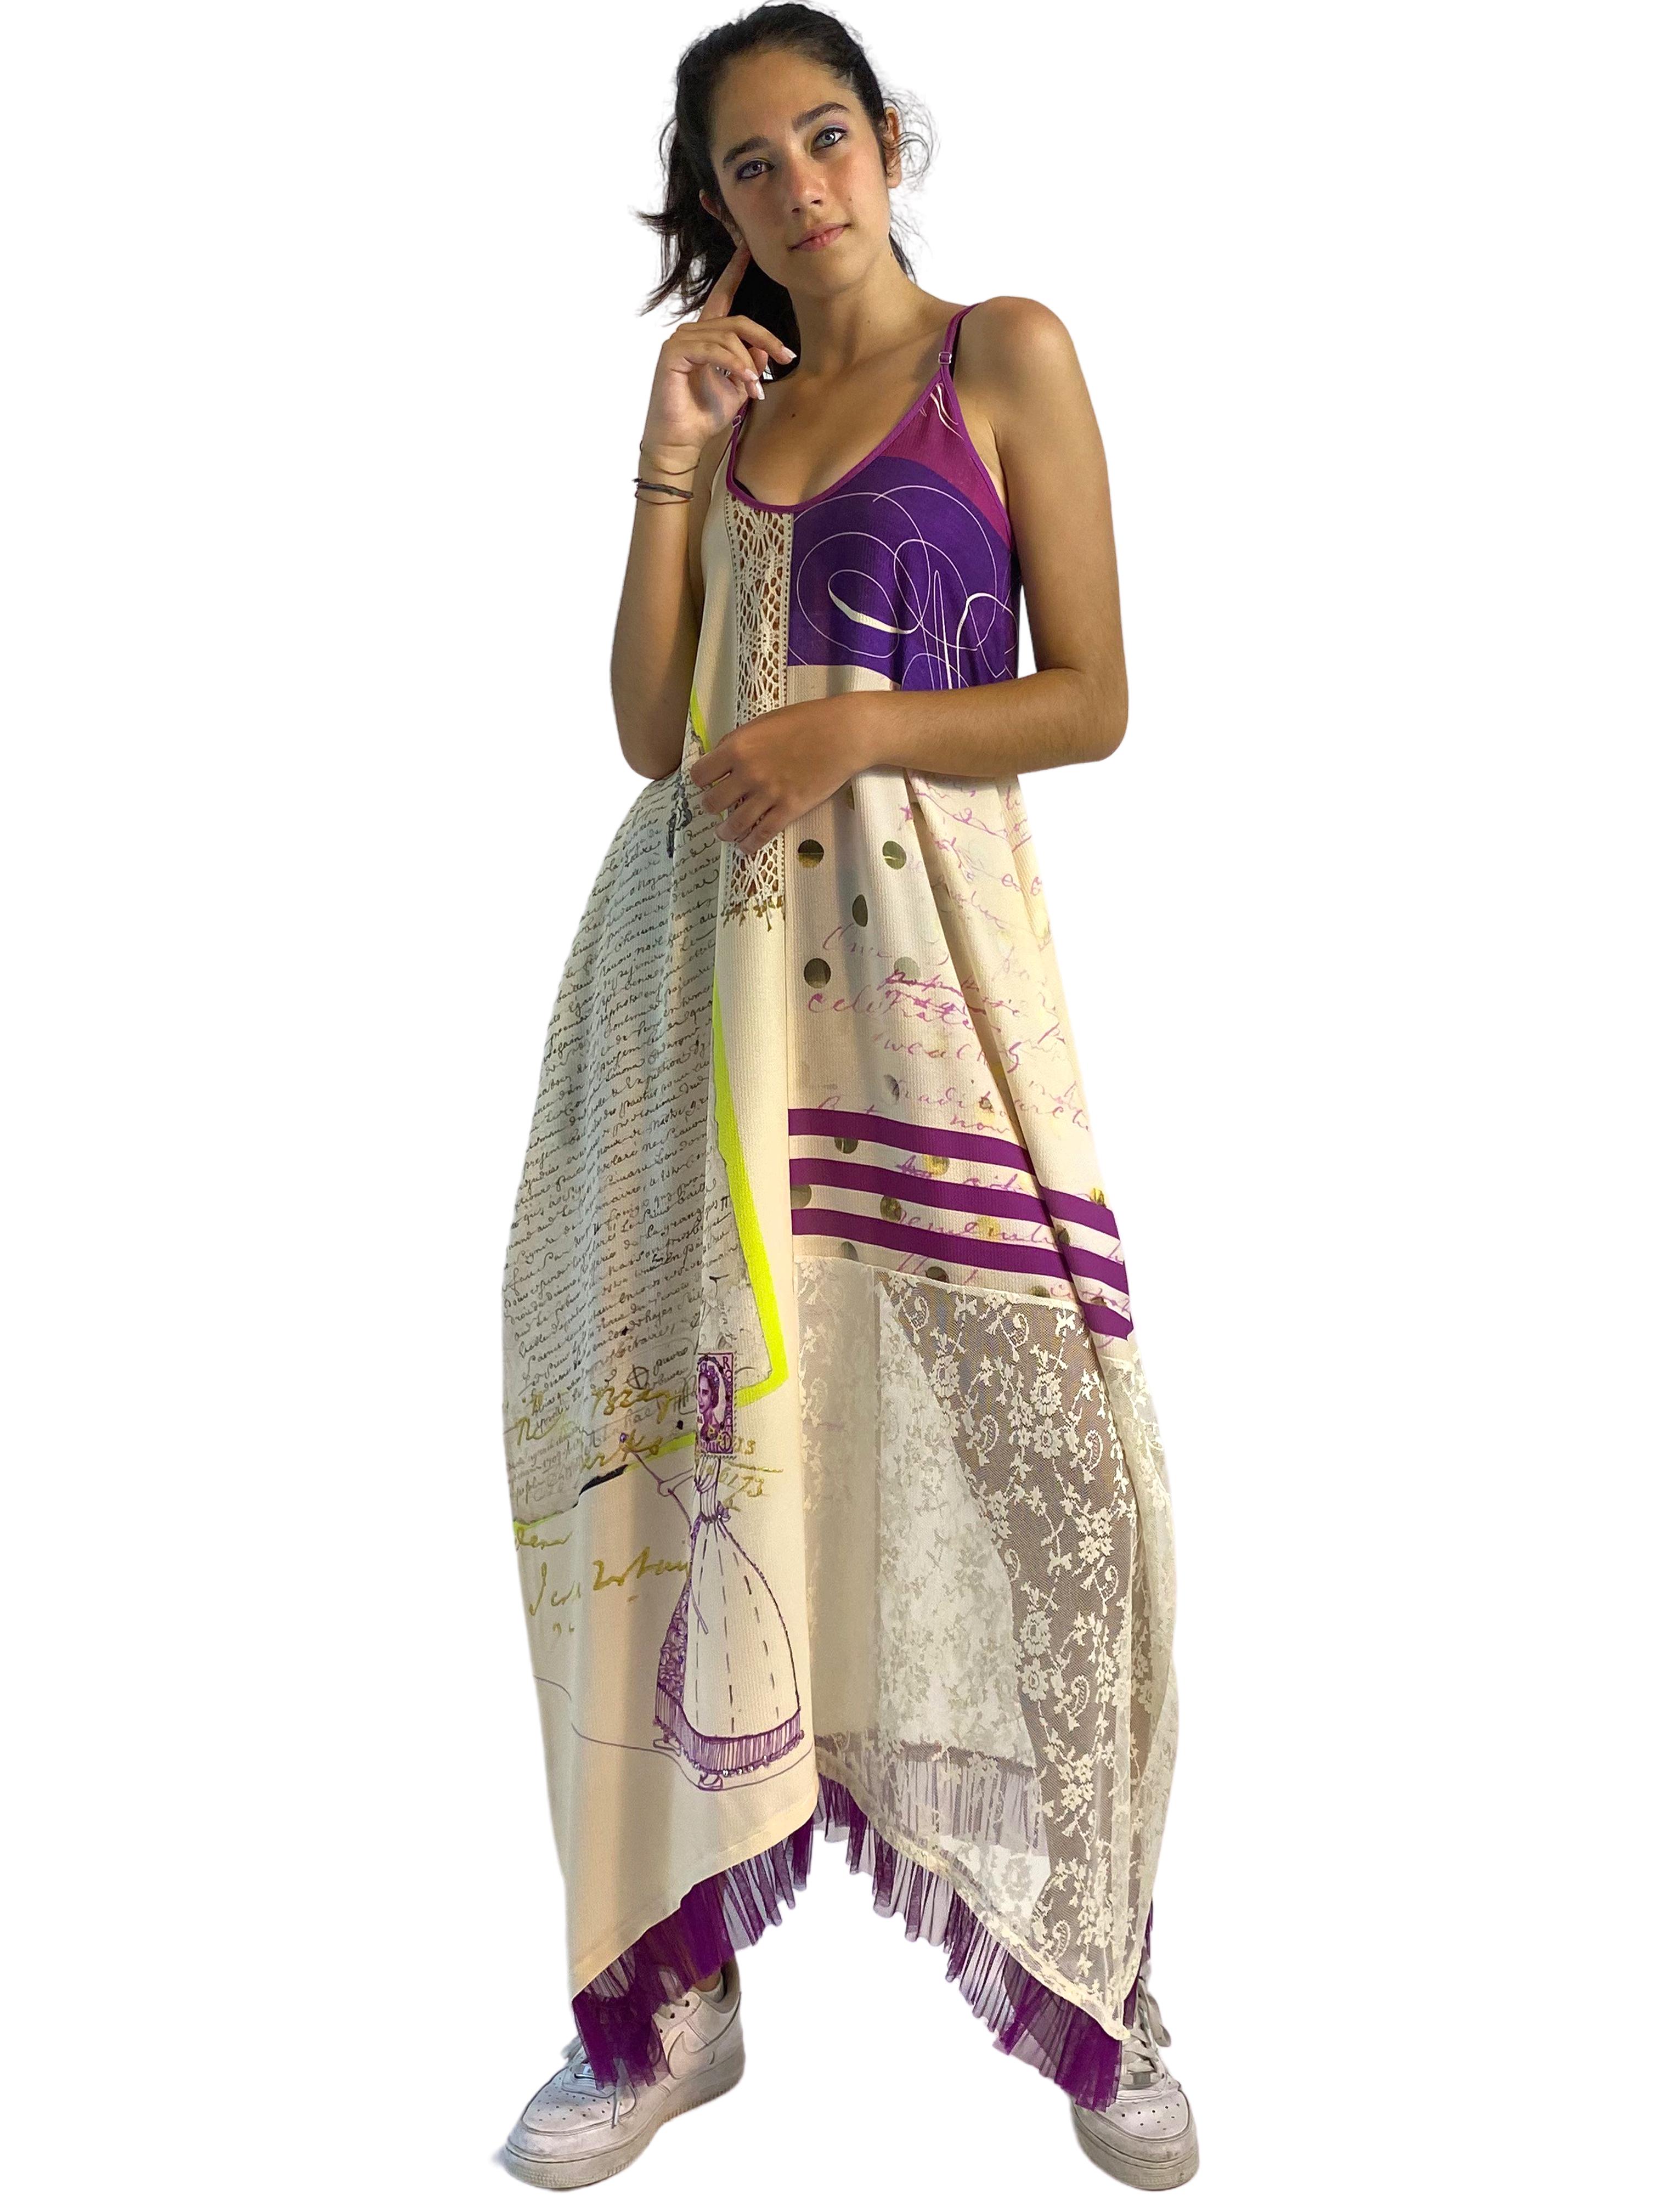 IPNG: If I Was Dancing In Paris Illusion V-Cut Maxi Dress IPNG_IIFDVN-003